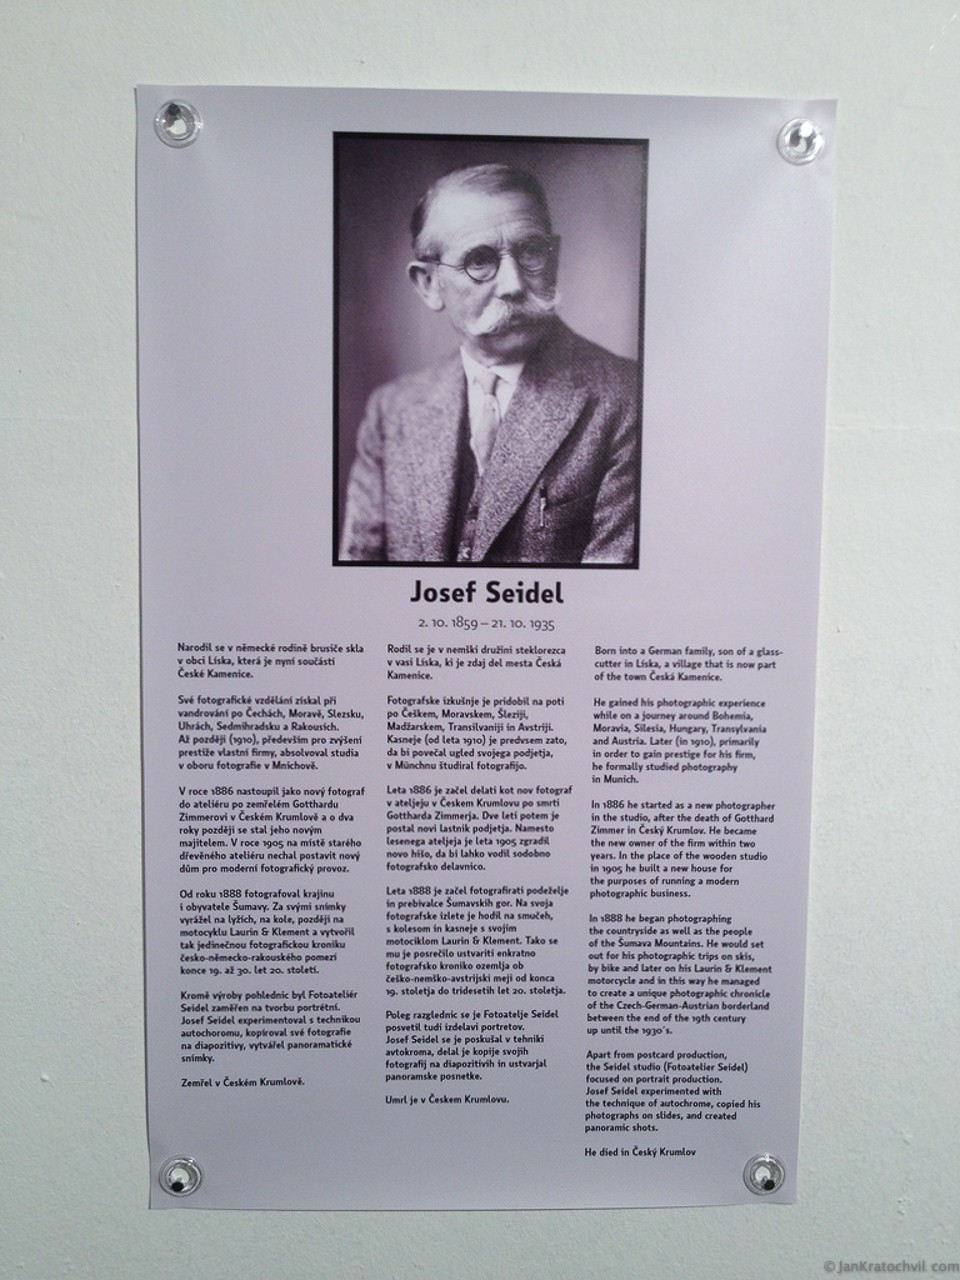 seidel-cesky-krumlov-vystava-celje-slovinsko-kolodium-collodion-wetplate-jan-kratochvil_3-2